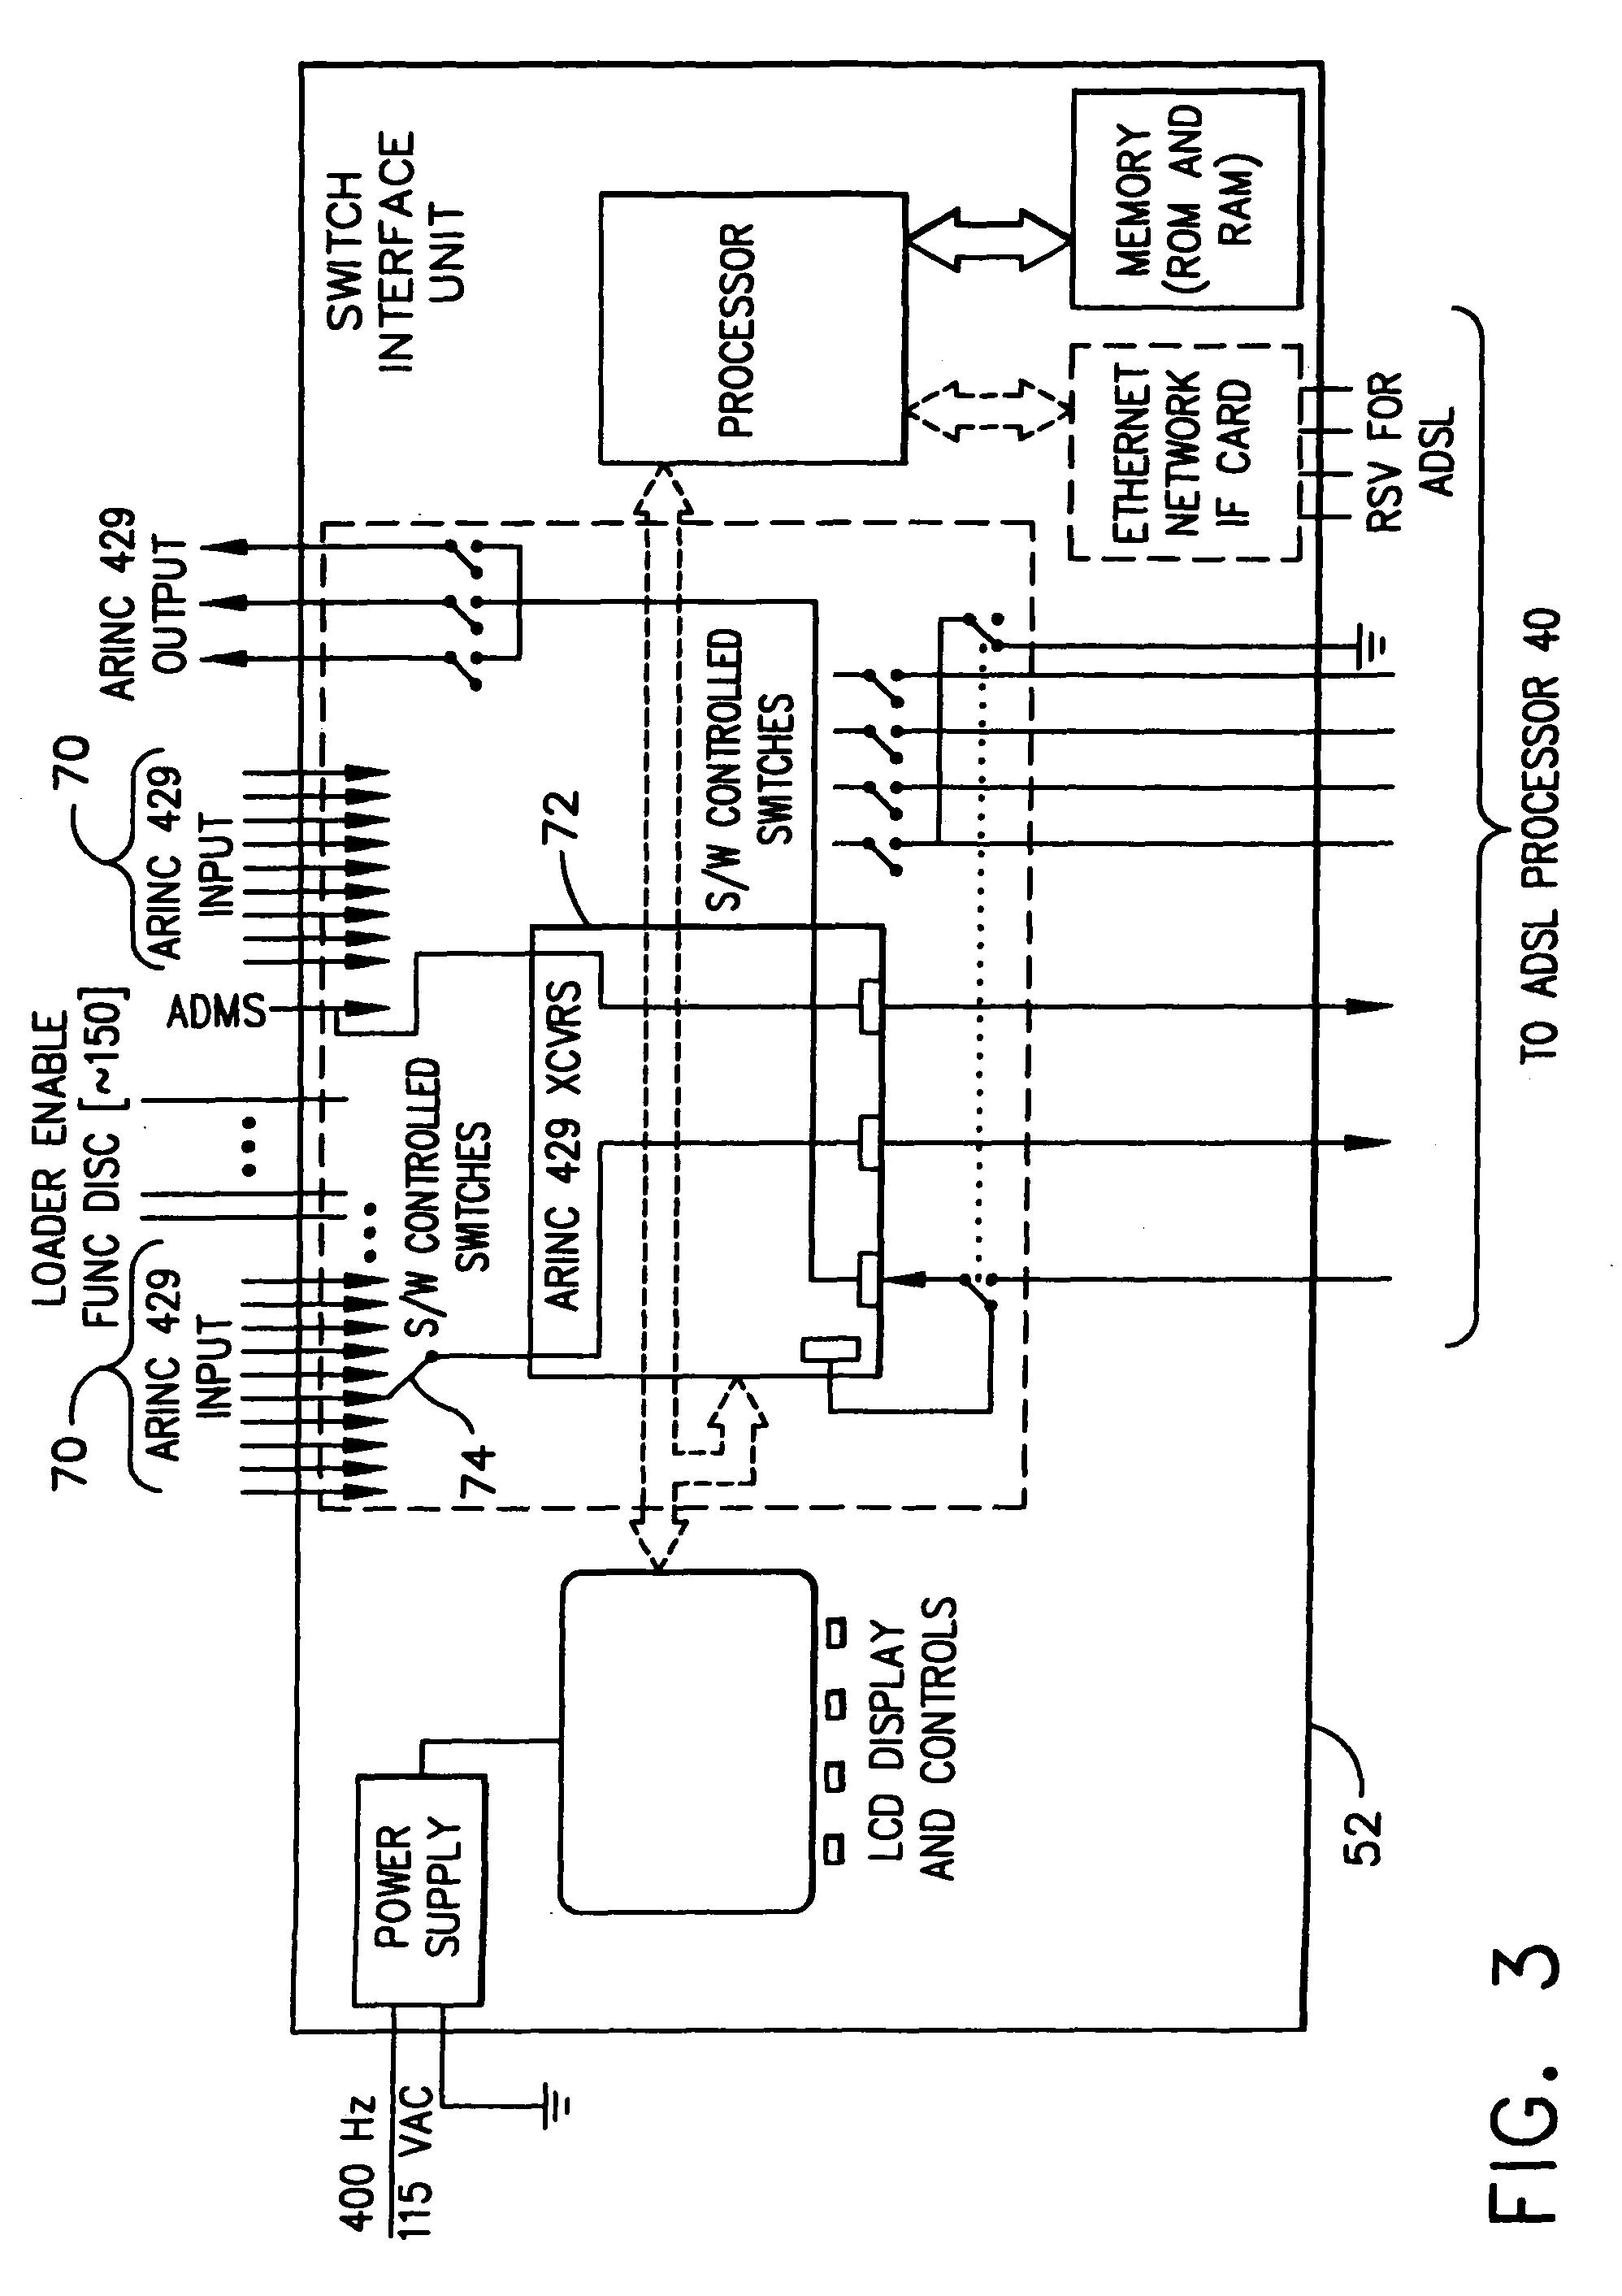 datatool system 3 wiring diagram 15 pin vga connector somurich